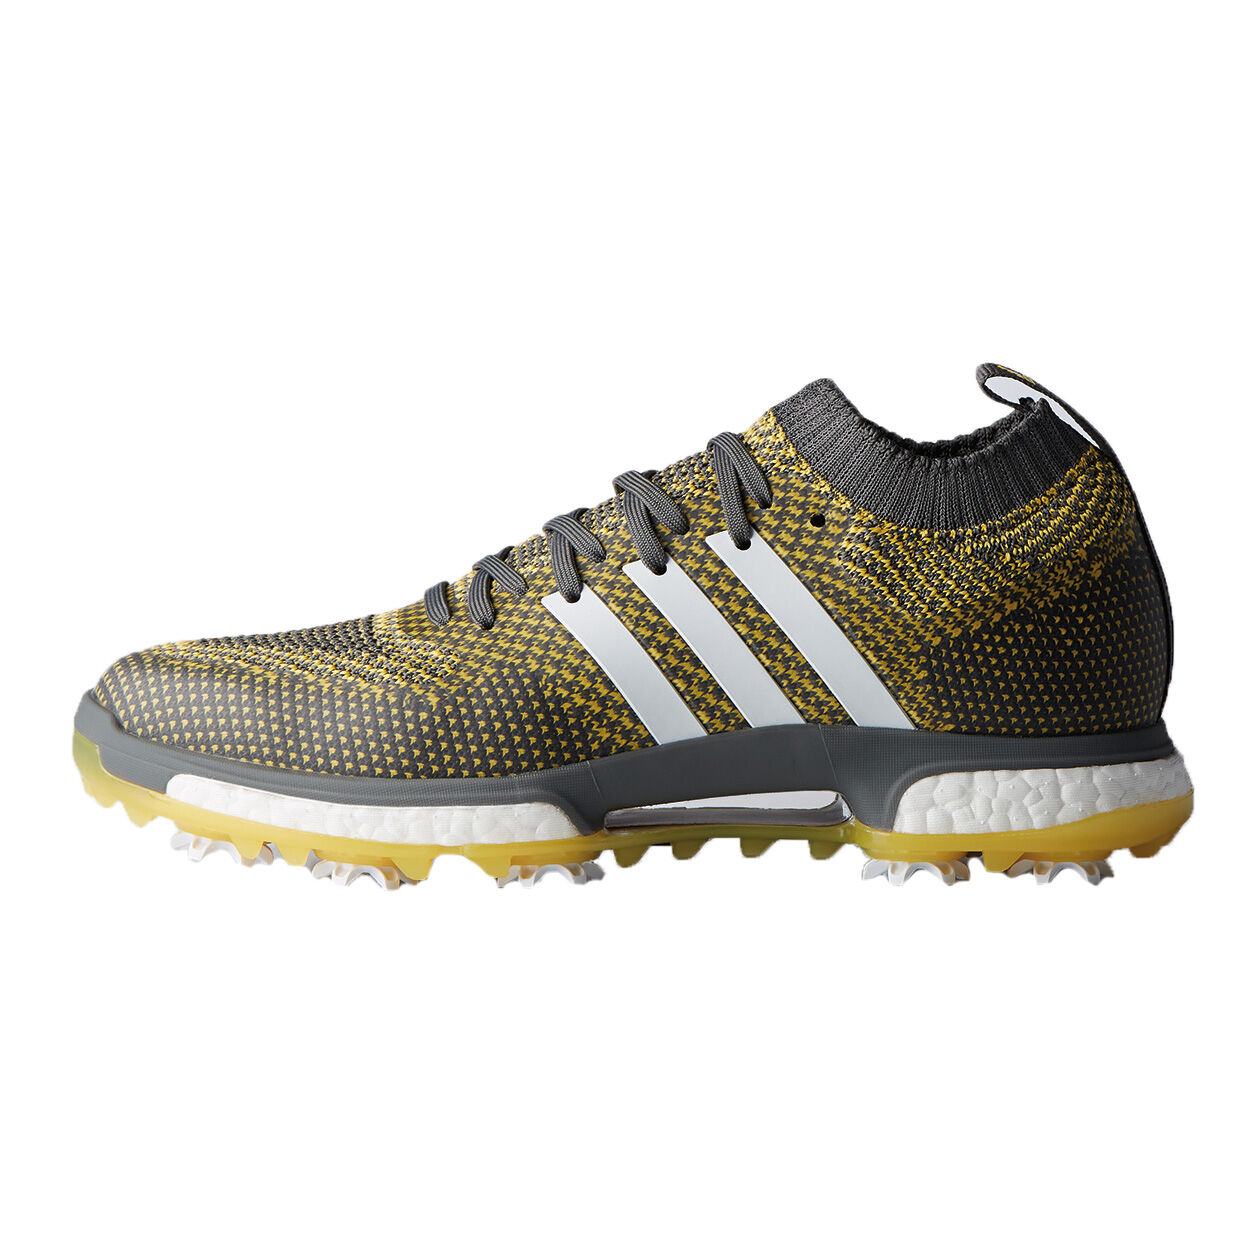 adidas knit 360 shoes golf